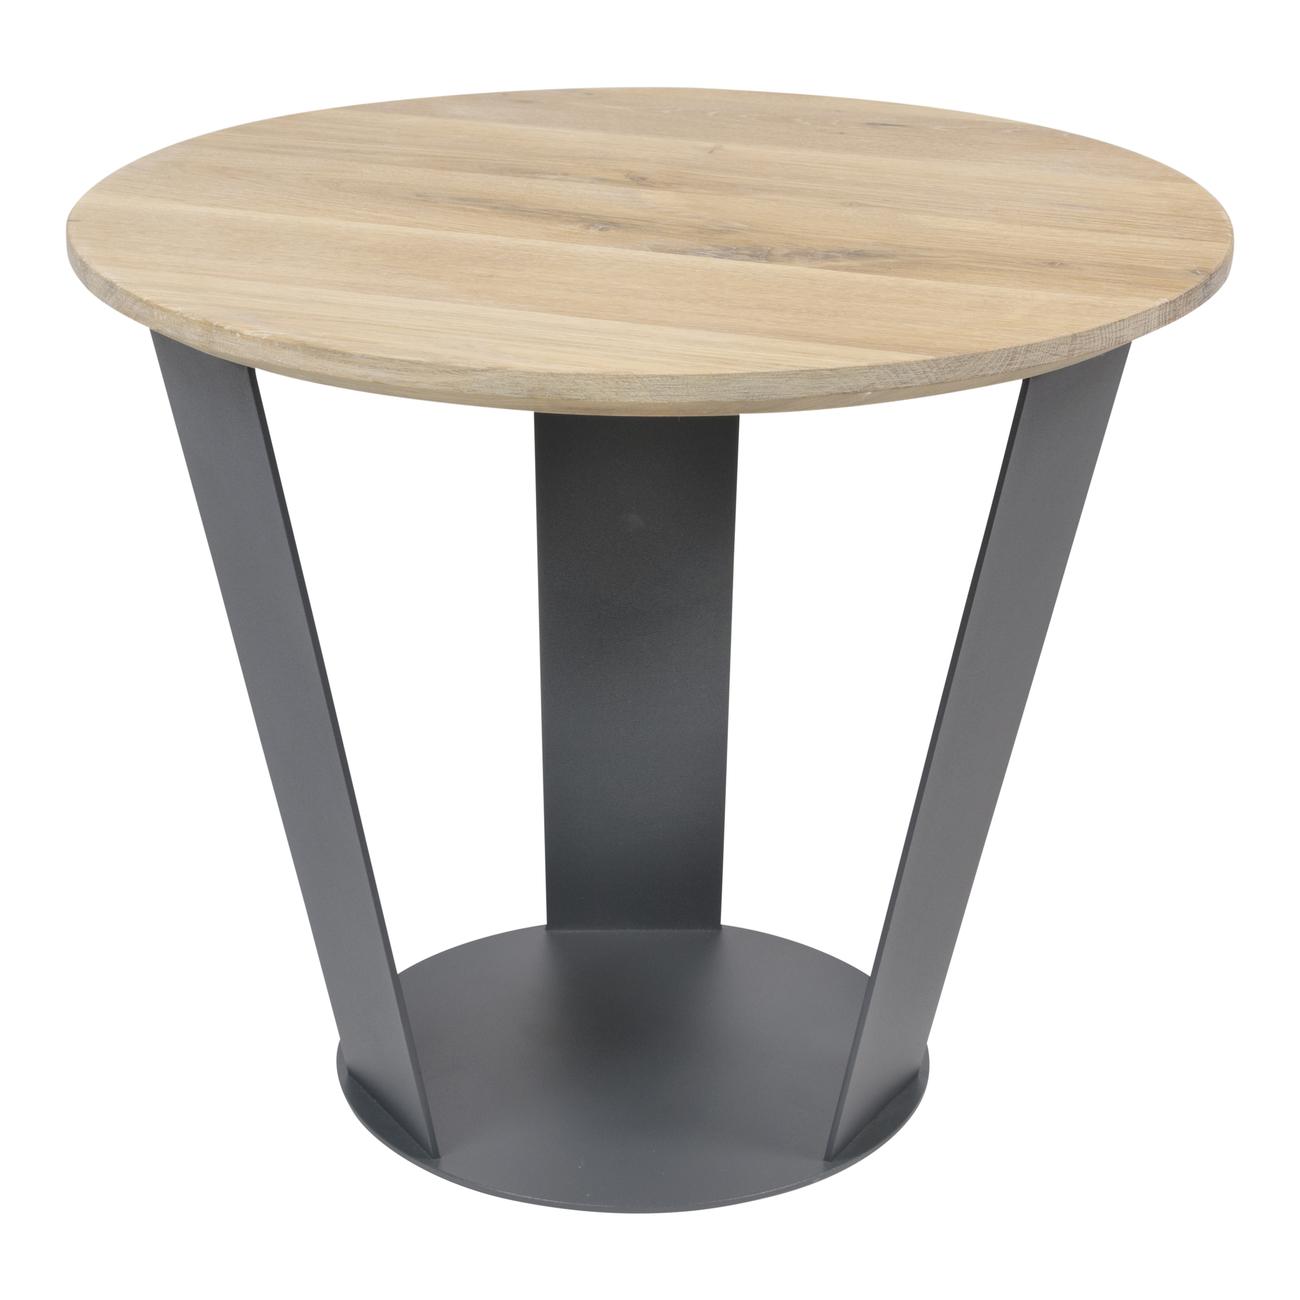 Torna Design Shine bijzettafel ø 45 cm